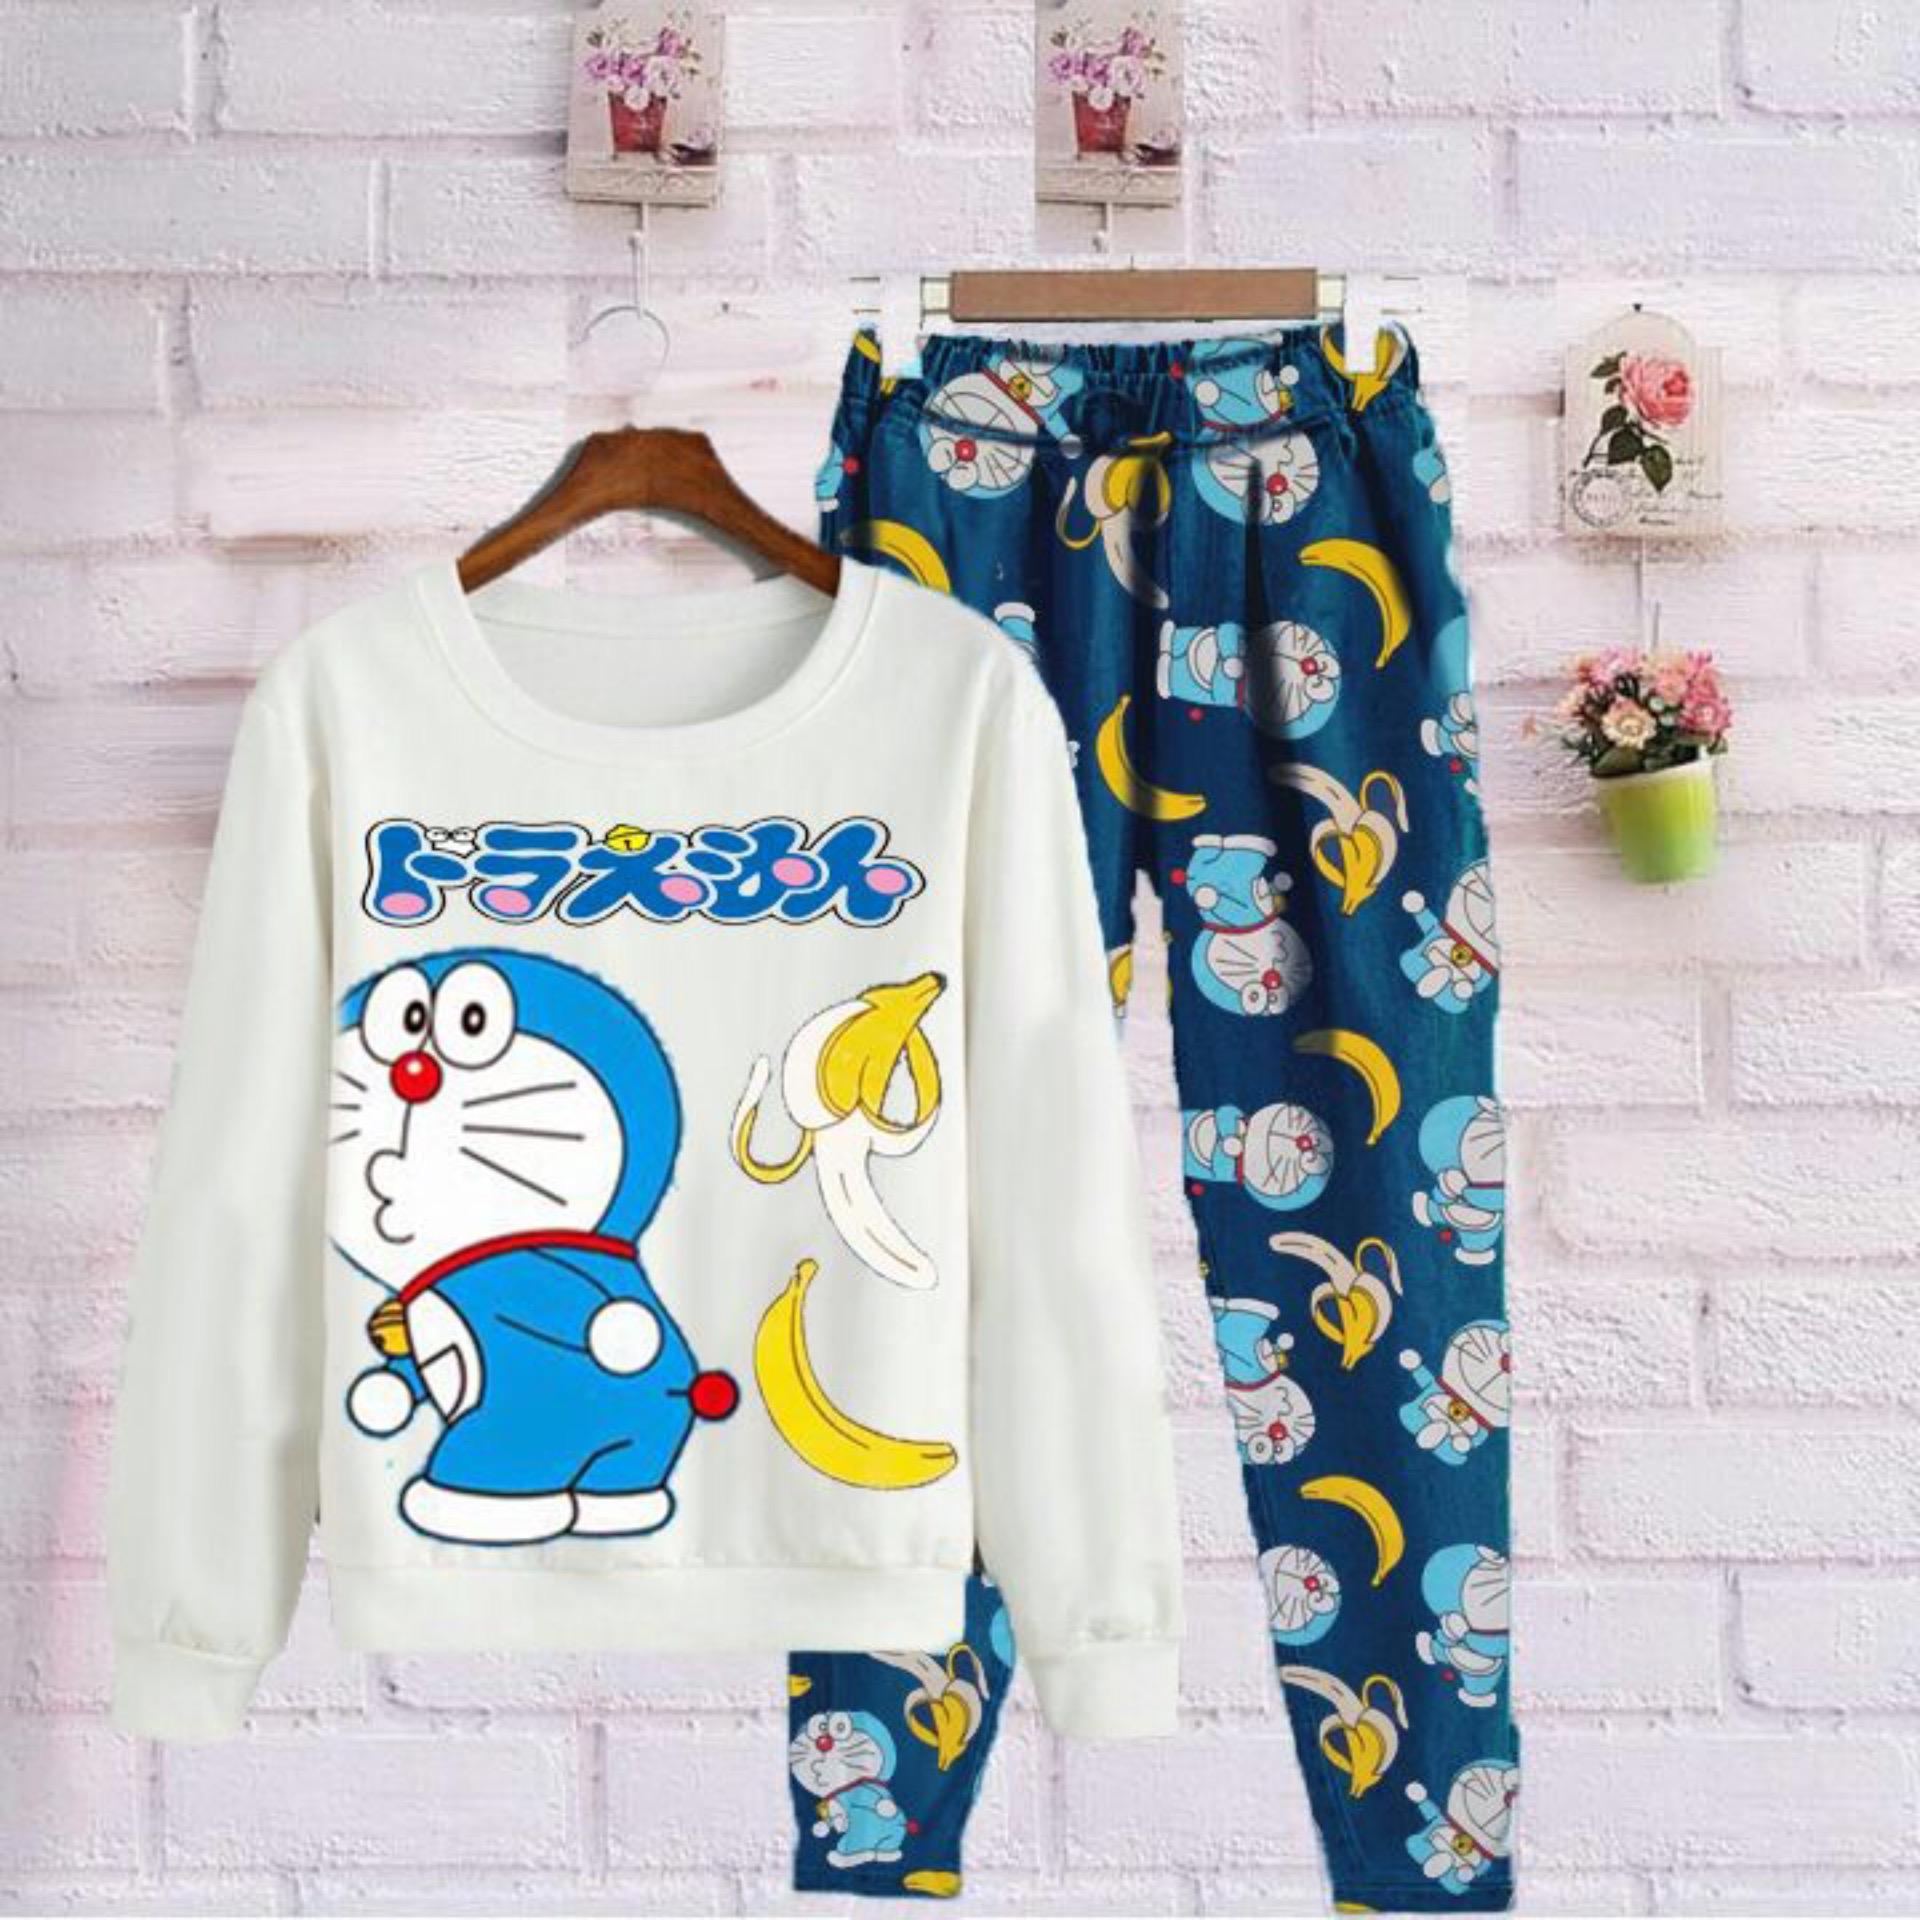 Shoppaholic Shop Baju Kodok Setelan Dora Banana / Baju Setelan / Baju Jamsuit / Celana Joger / Celana Katun / Baju Doraemon / Baju Kodok / Celana Panjang Wanita / Kaos Bagus